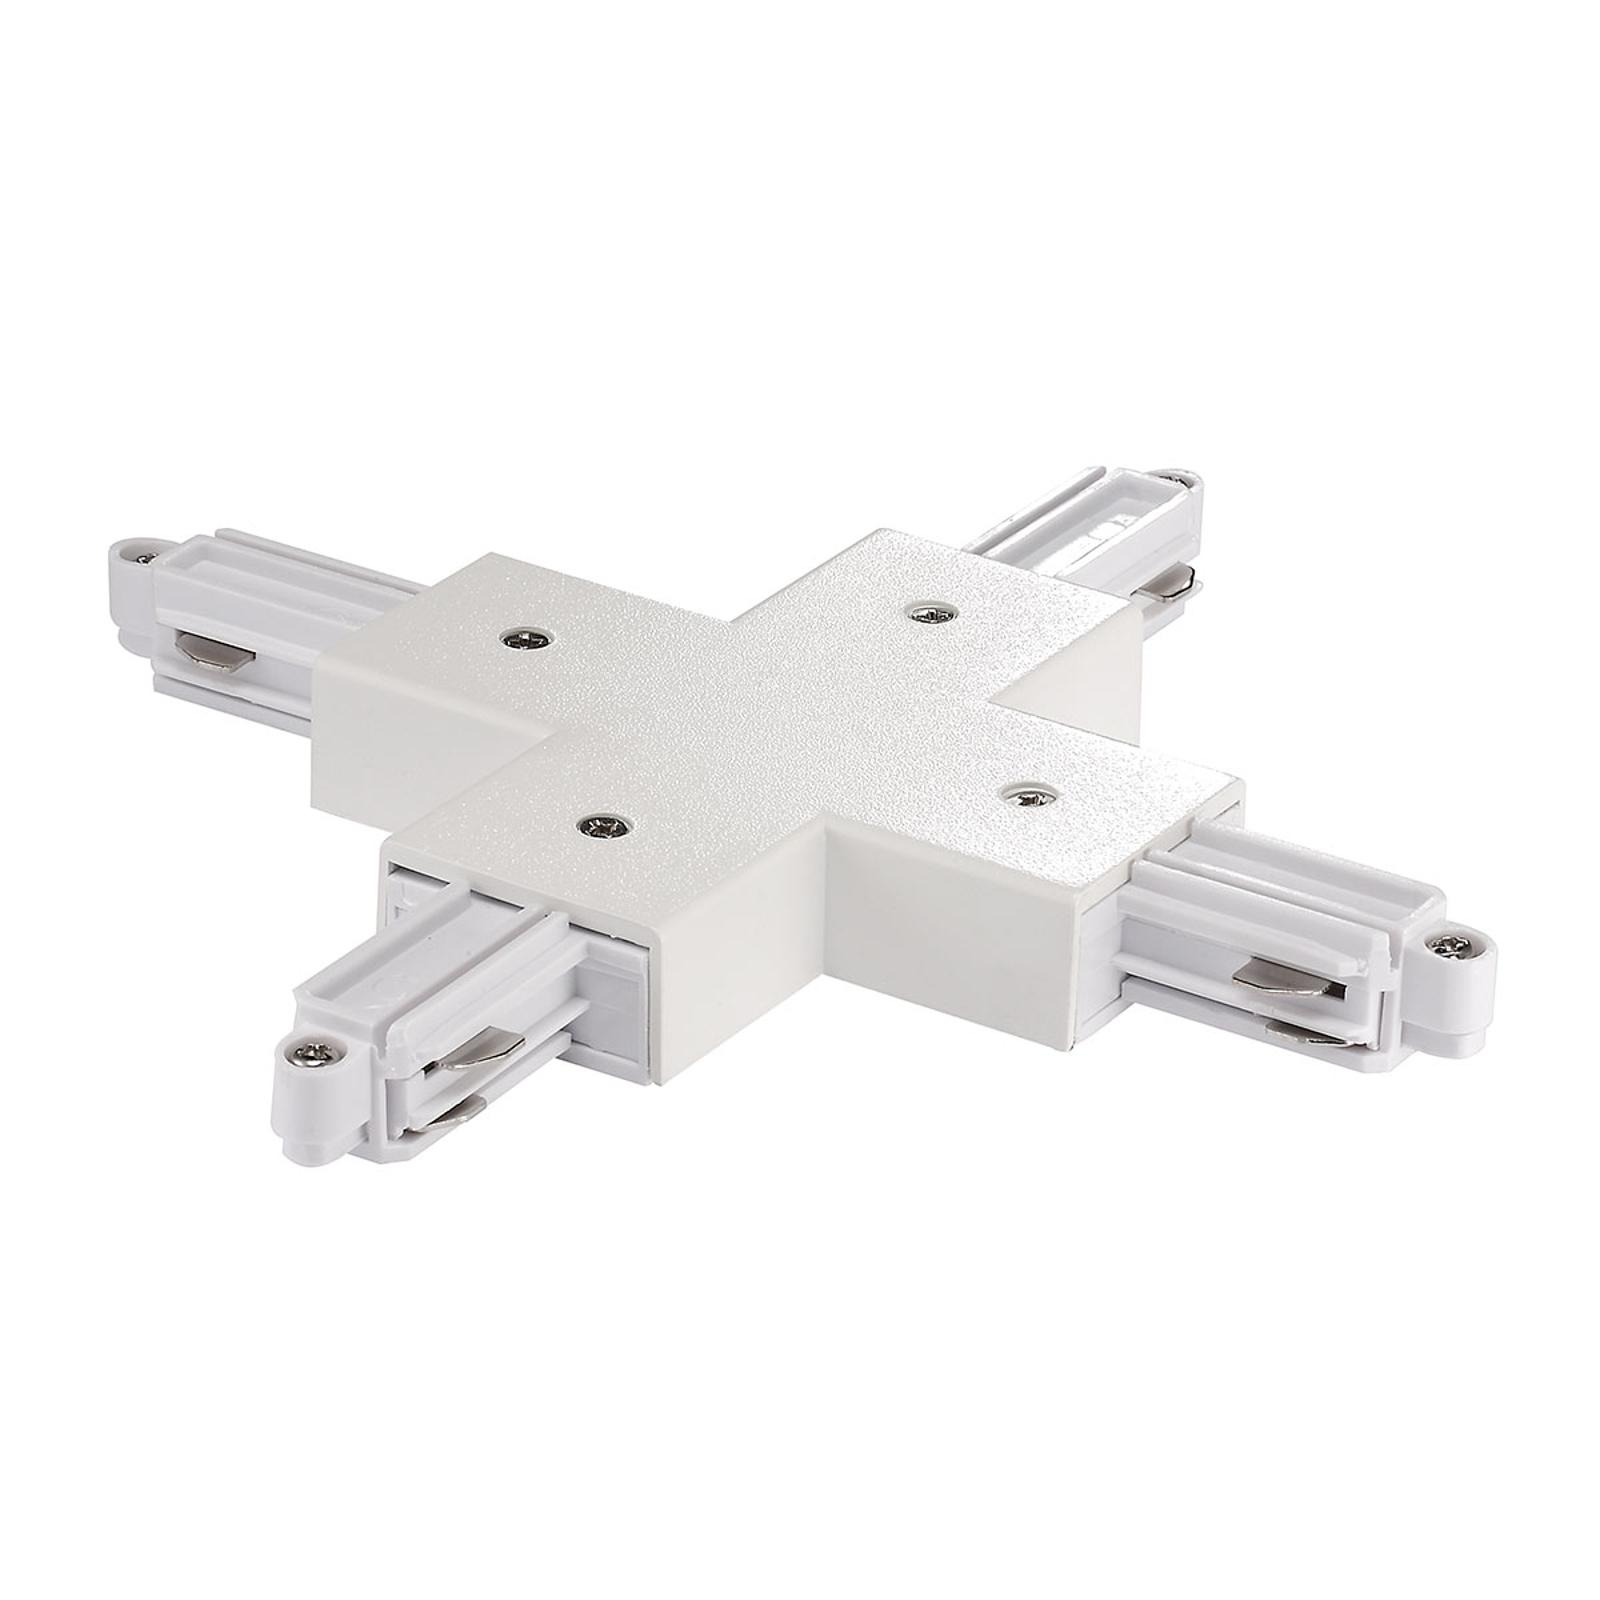 X-kontakt for strømskinne Link, hvit